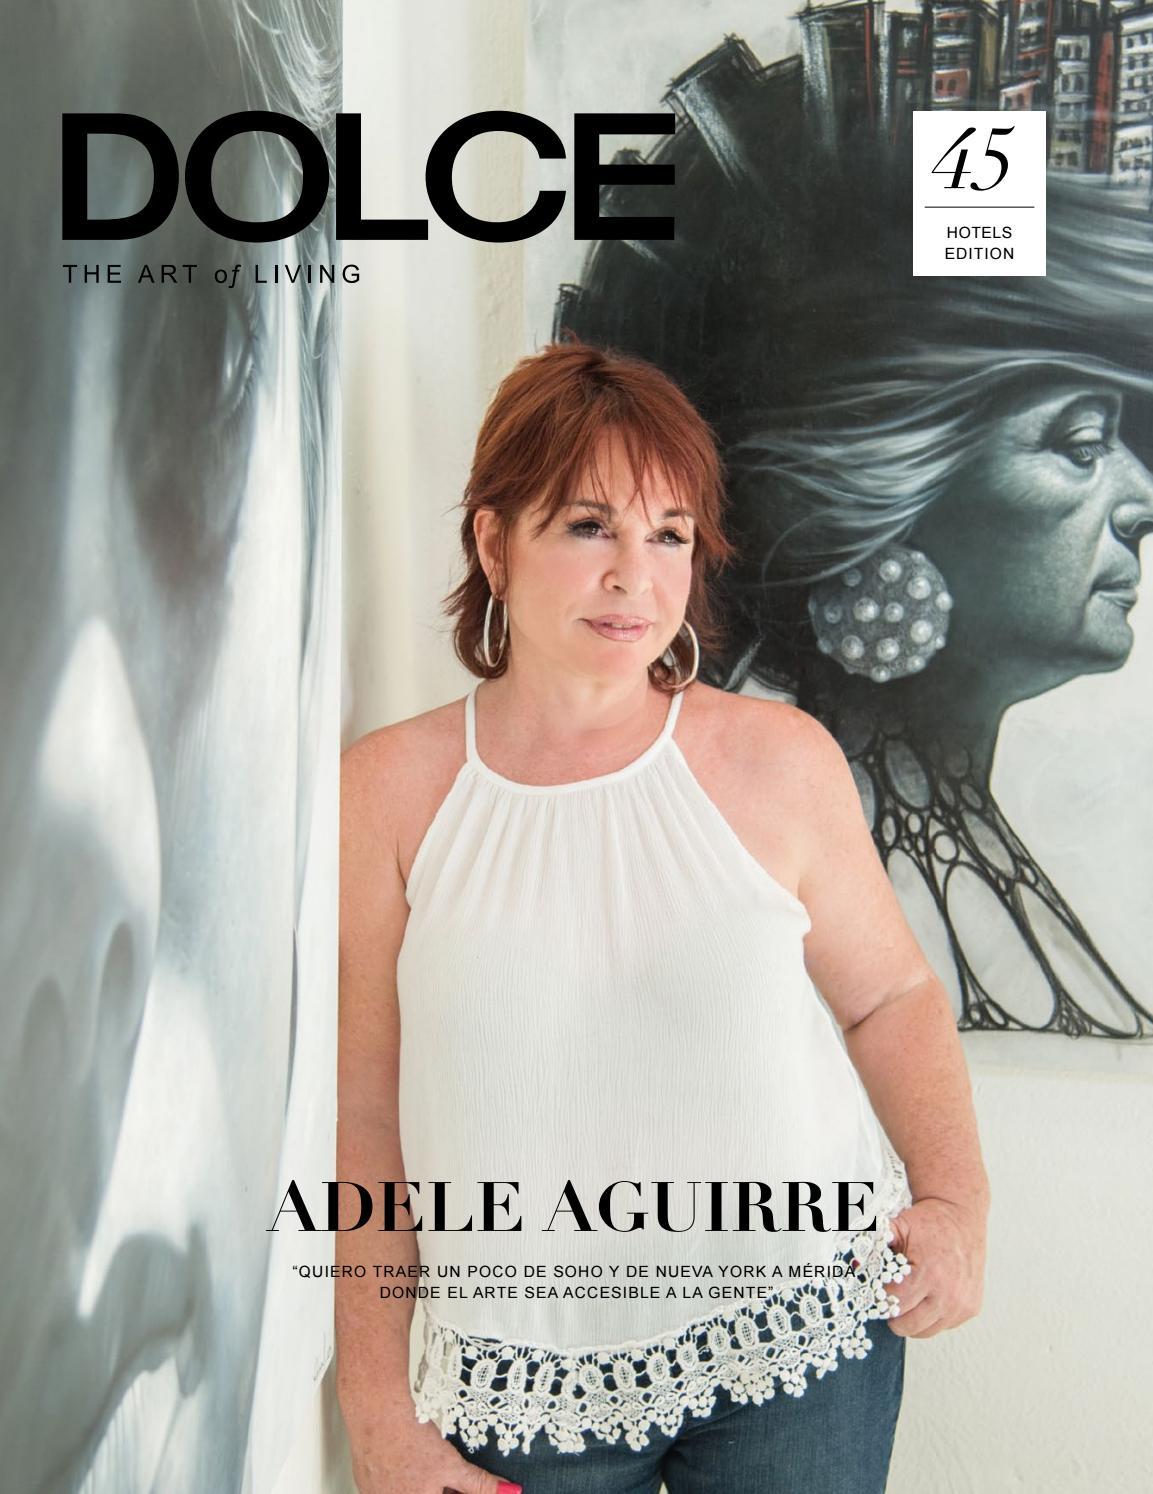 DOLCE Magazine No.45 / 2016 Hotels Edition - Personnalité: ADELE ...